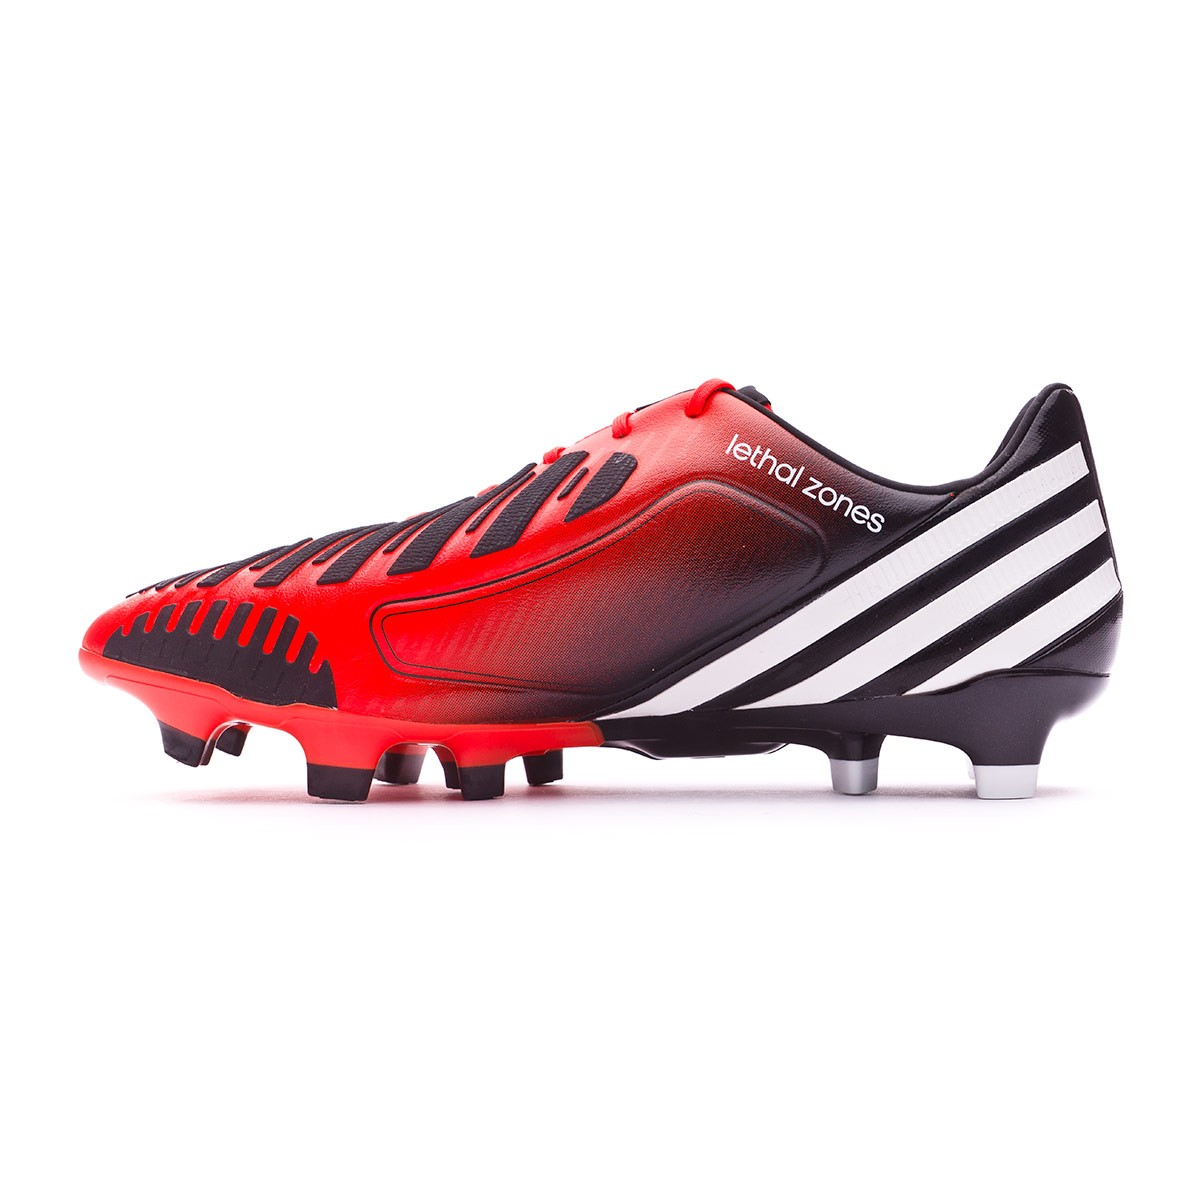 newest 31e07 b827f Football Boots adidas Predator LZ TRX FG Red-Black - Football store Fútbol  Emotion